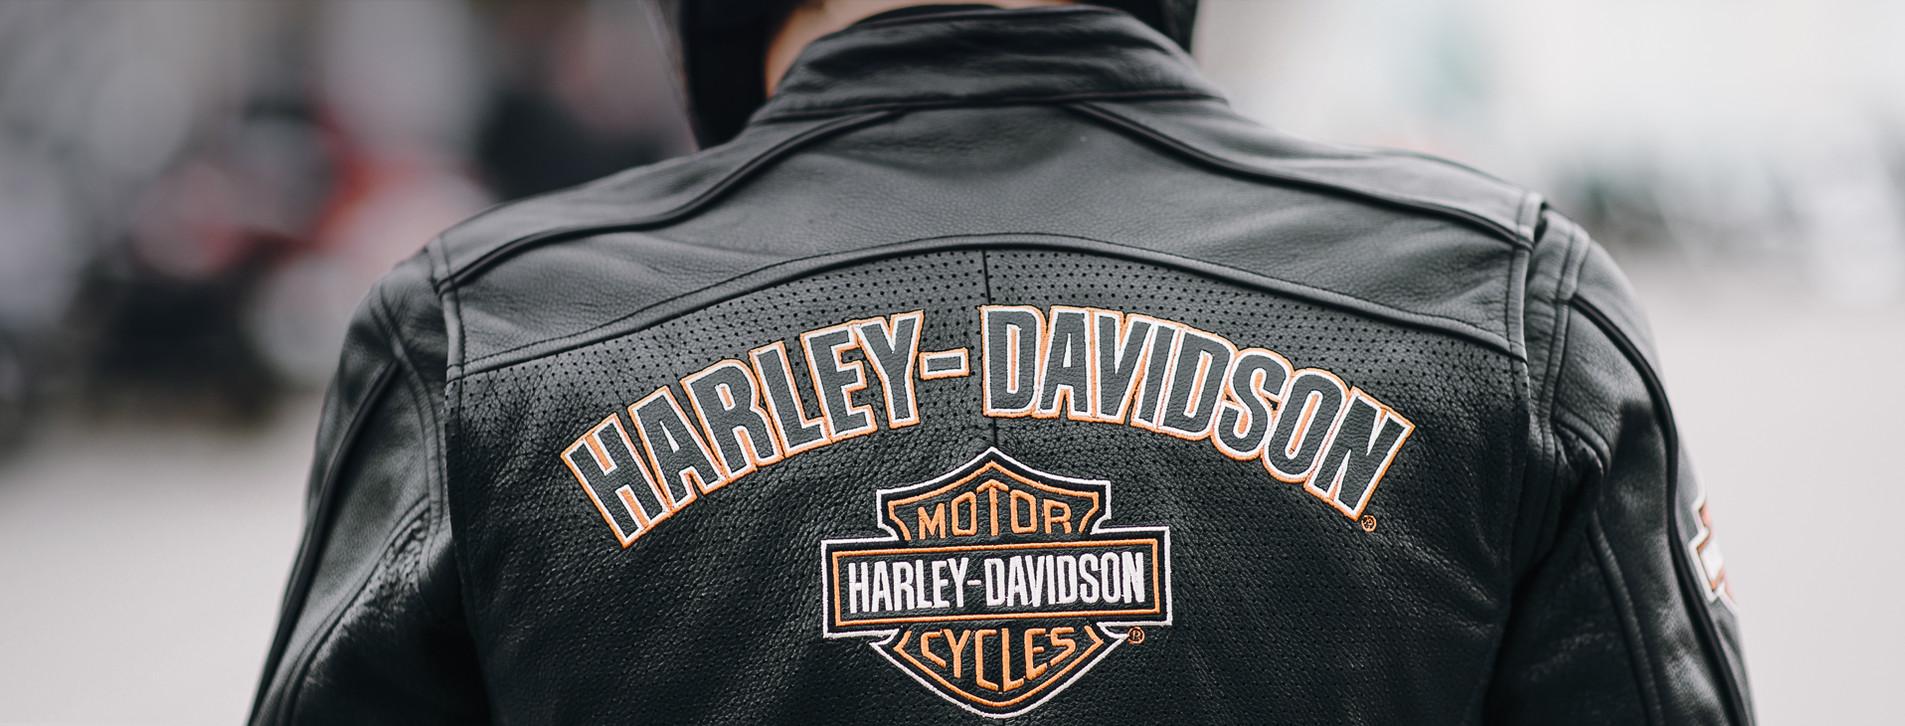 Фото - Урок на Harley-Davidson